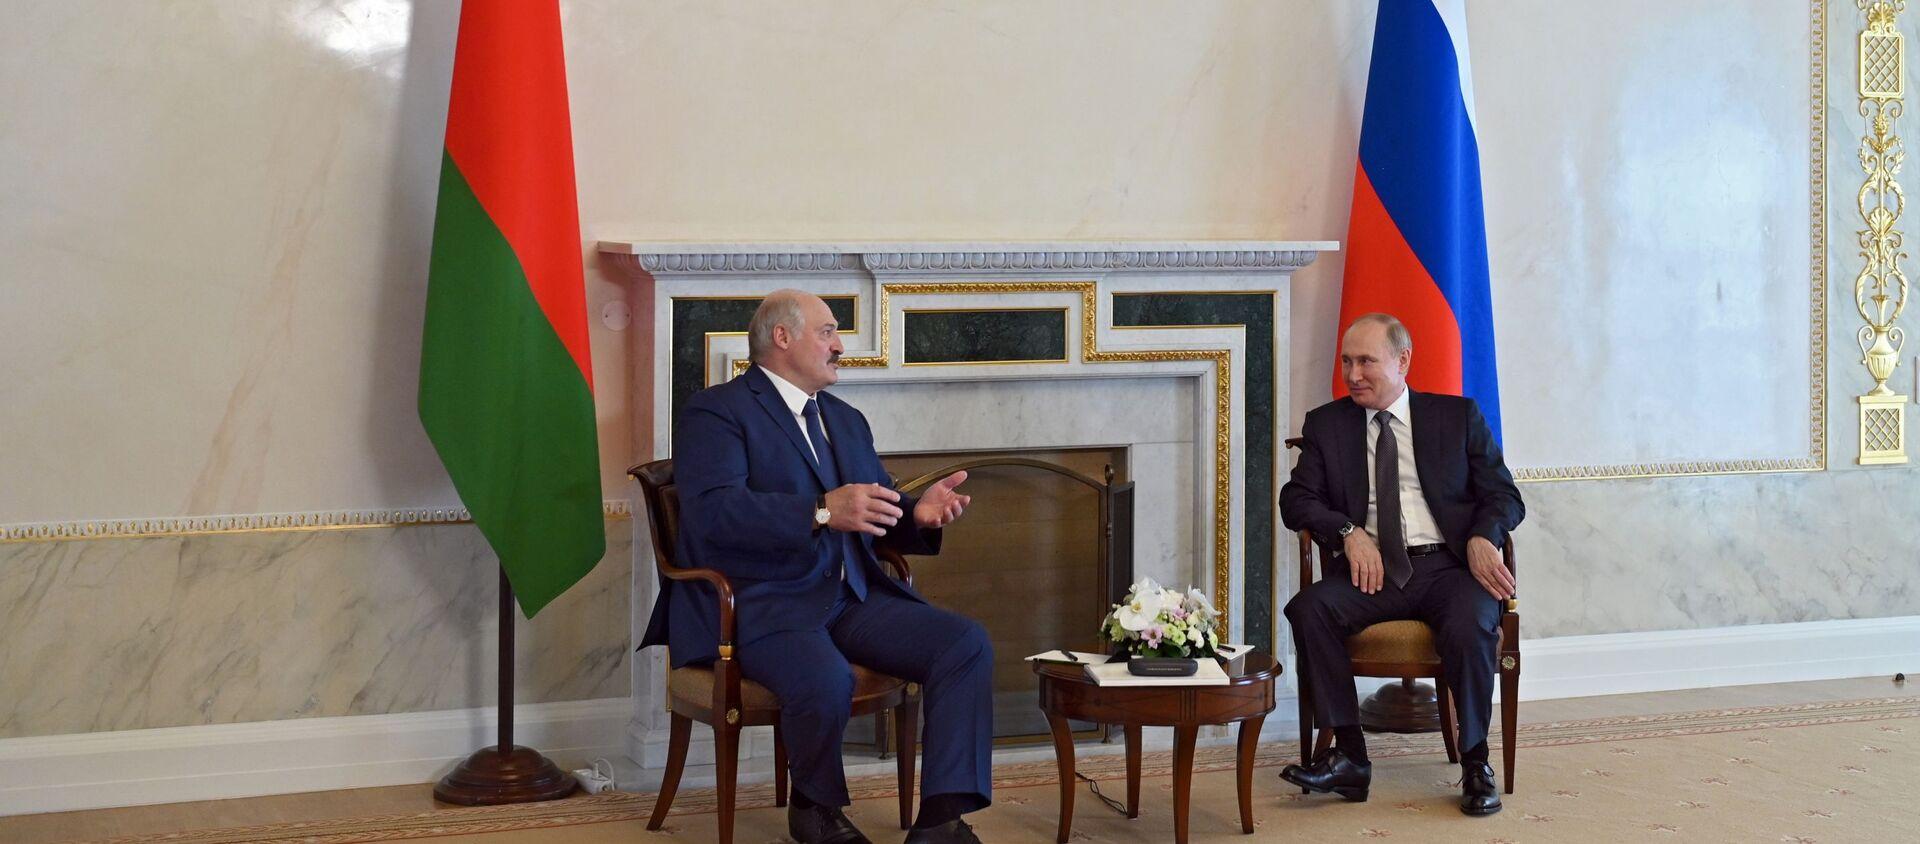 Рабочая встреча президента РФ В. Путина с президентом Белоруссии А. Лукашенко - Sputnik Абхазия, 1920, 09.09.2021